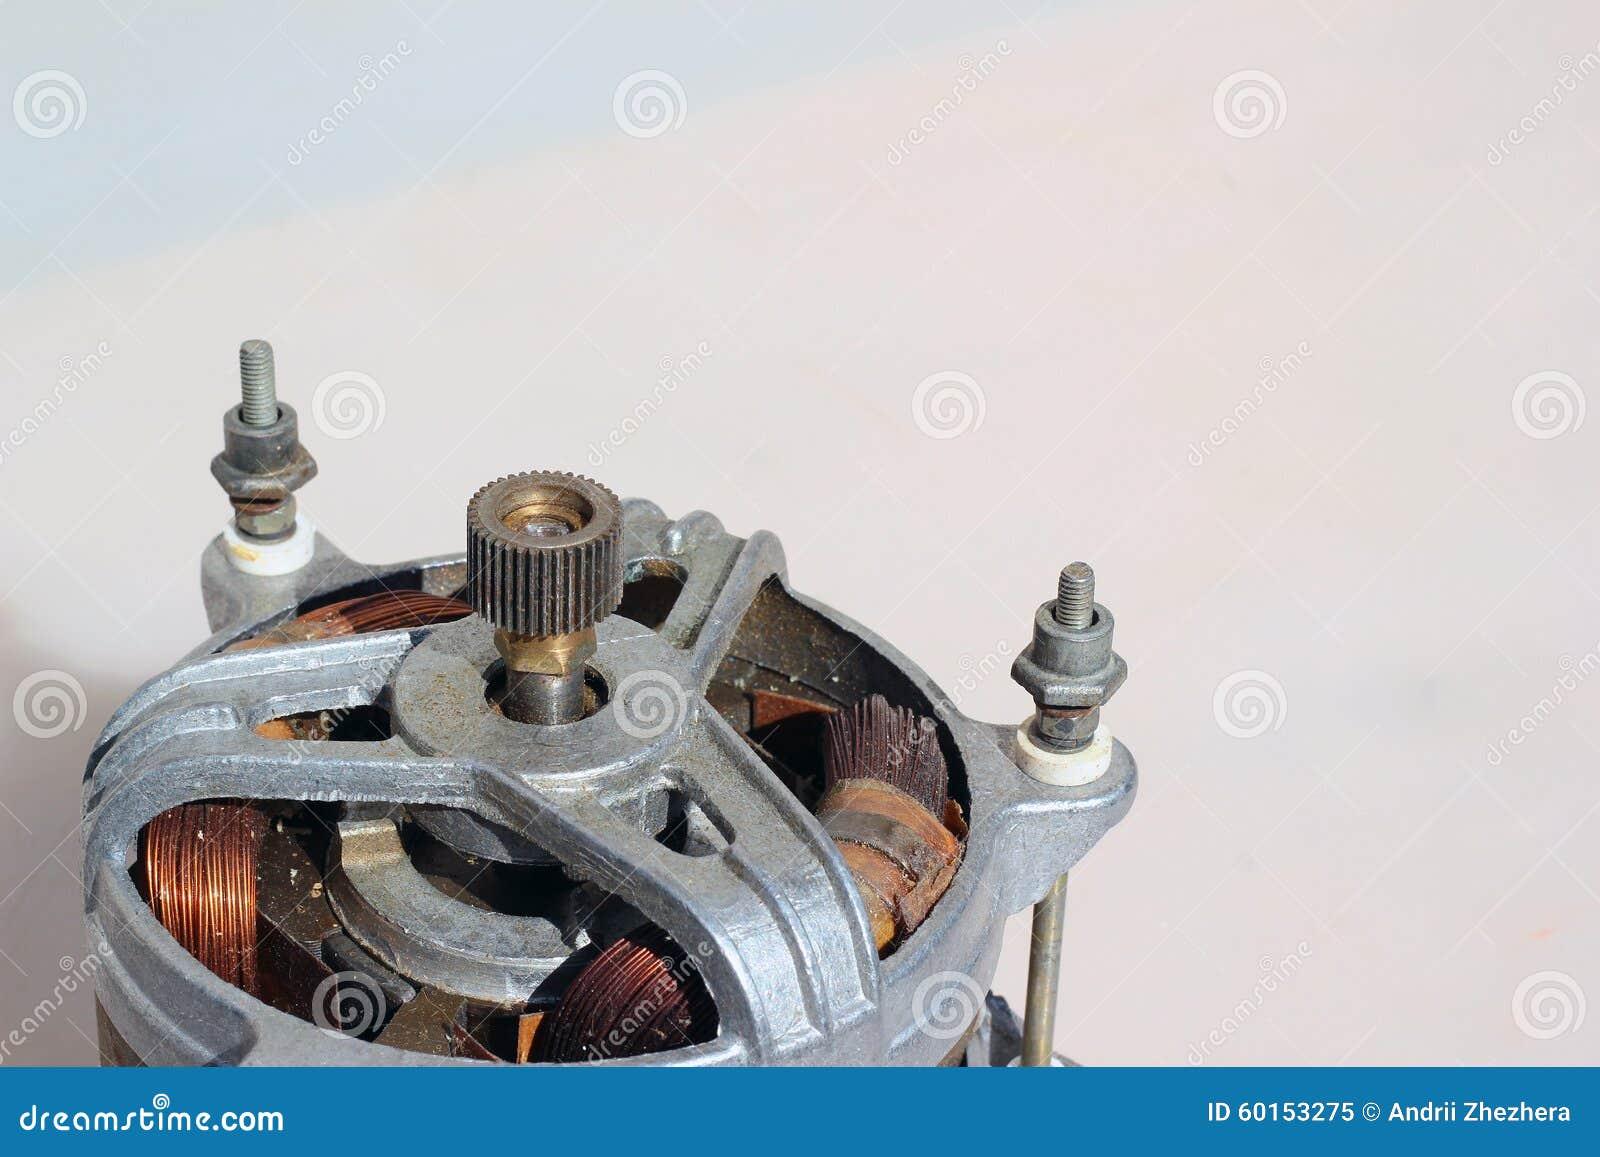 Old electric motor, background image